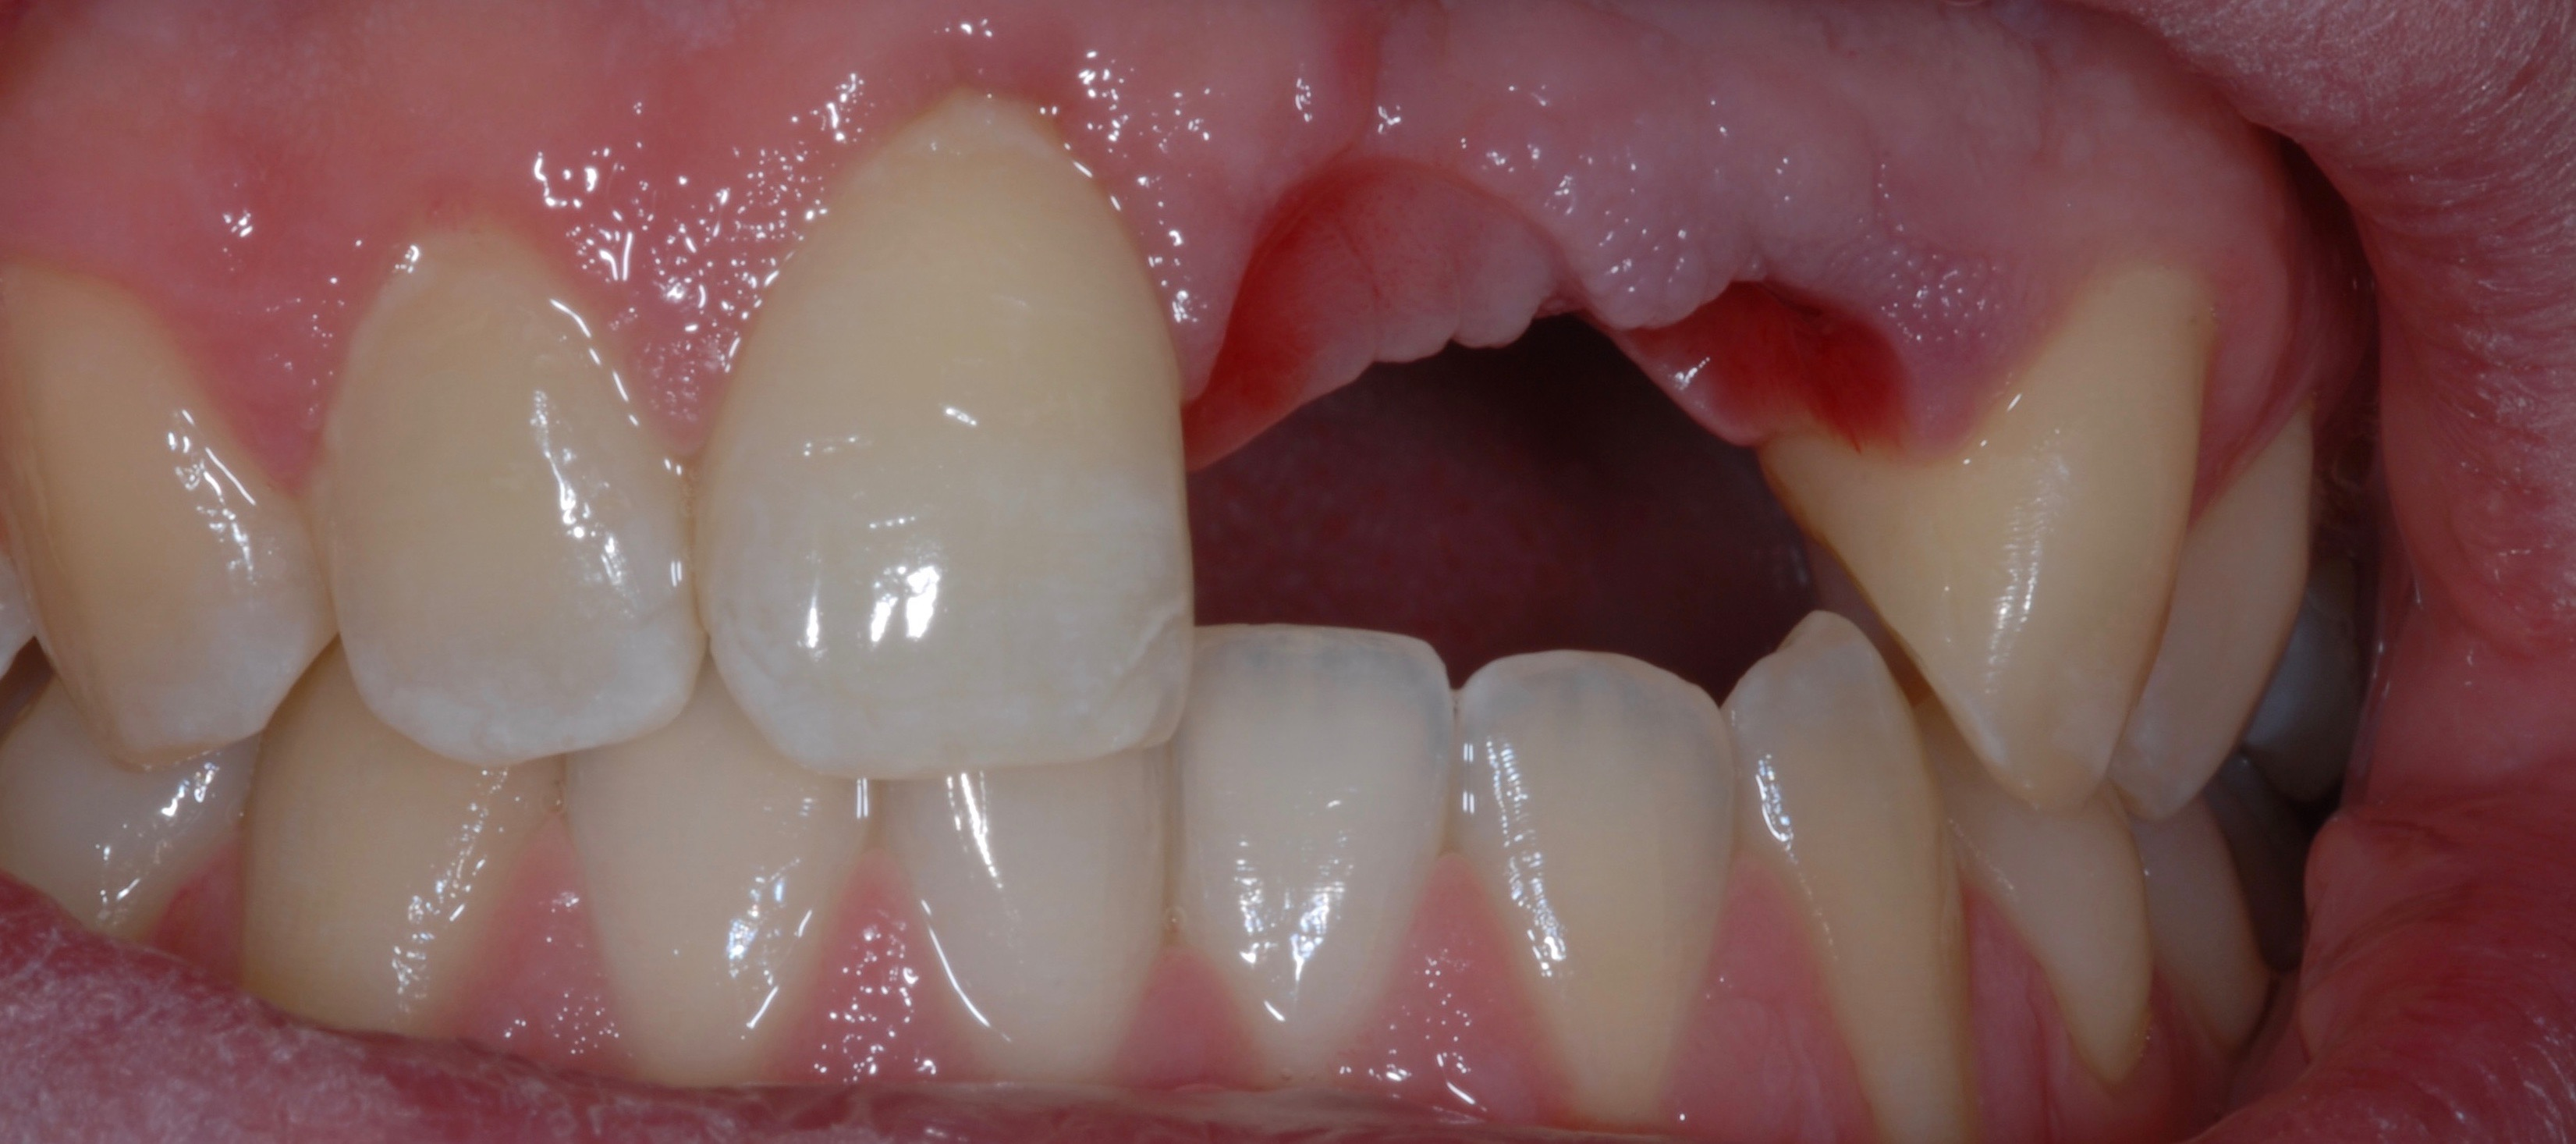 Implant Problem - Before